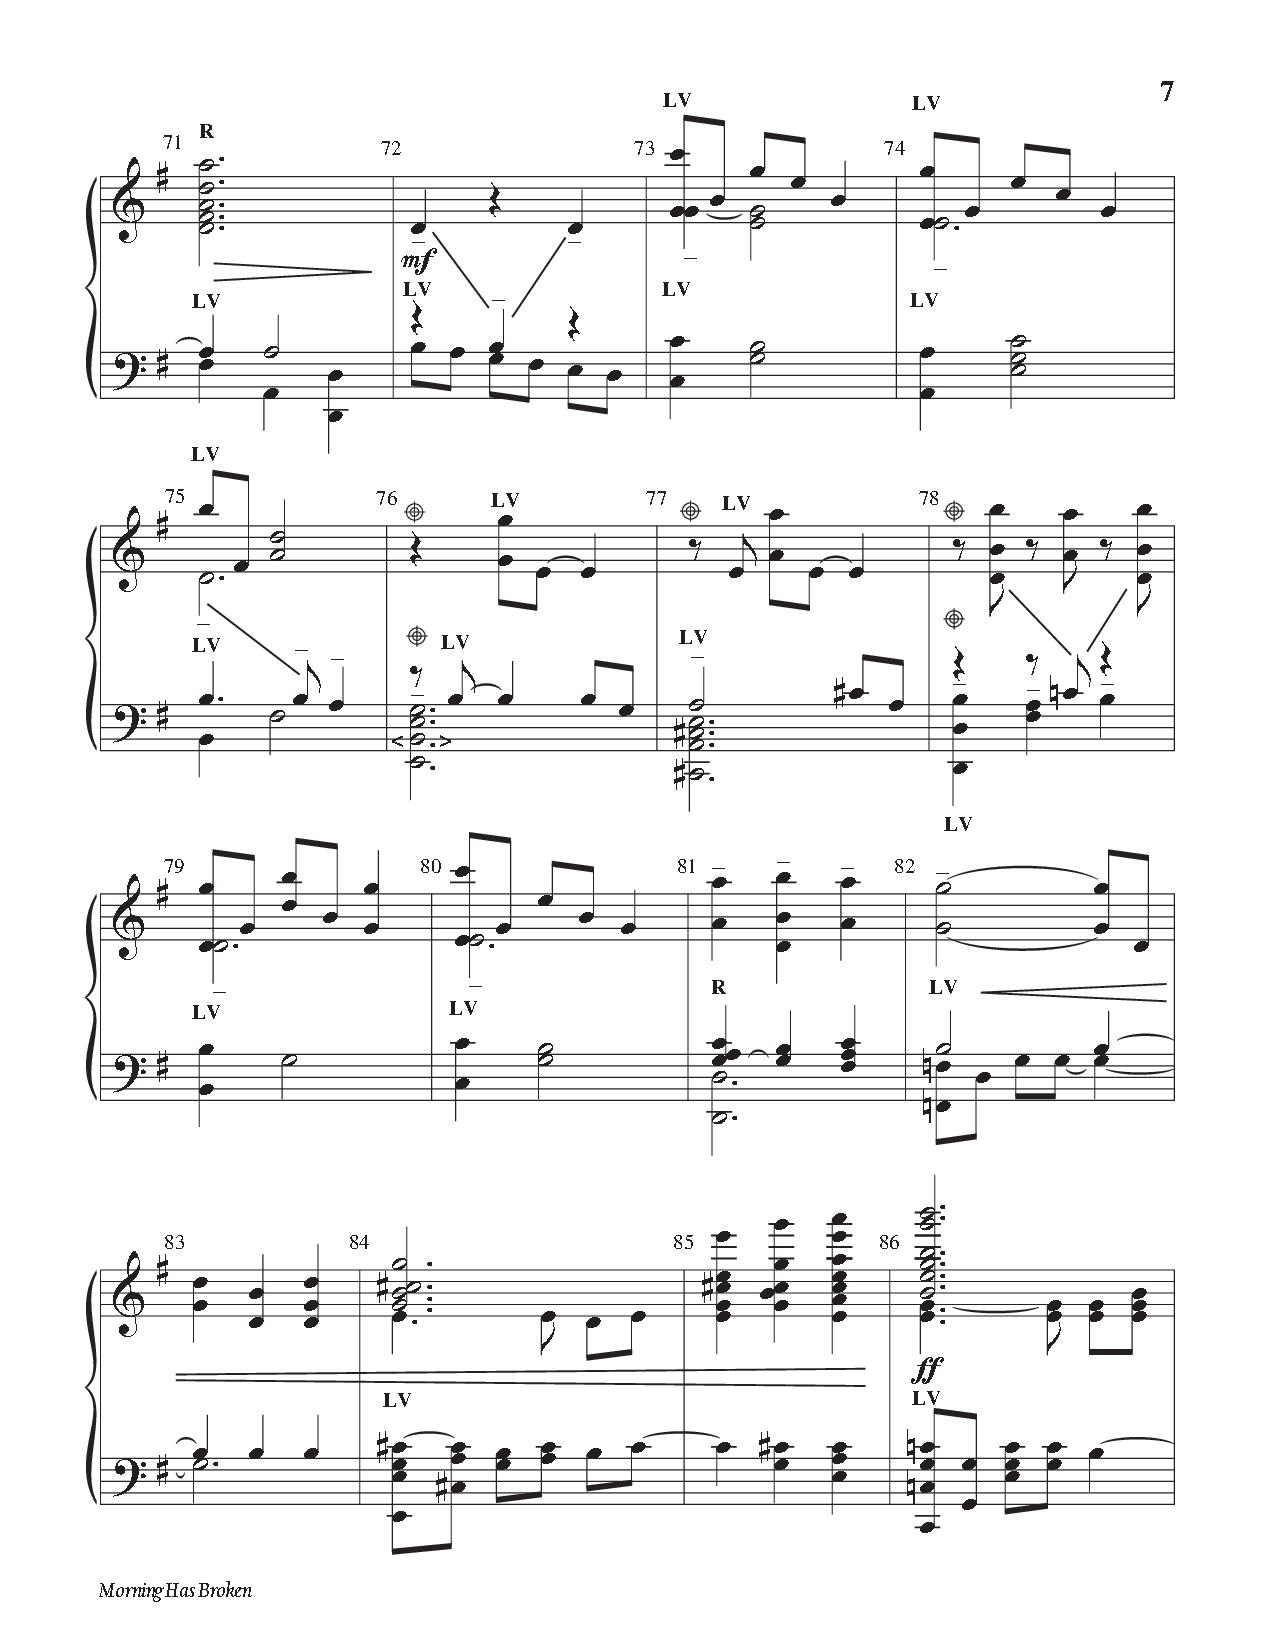 Morning Has Broken arr. Larry Shackley & Arnold | J.W. Pepper Sheet Music